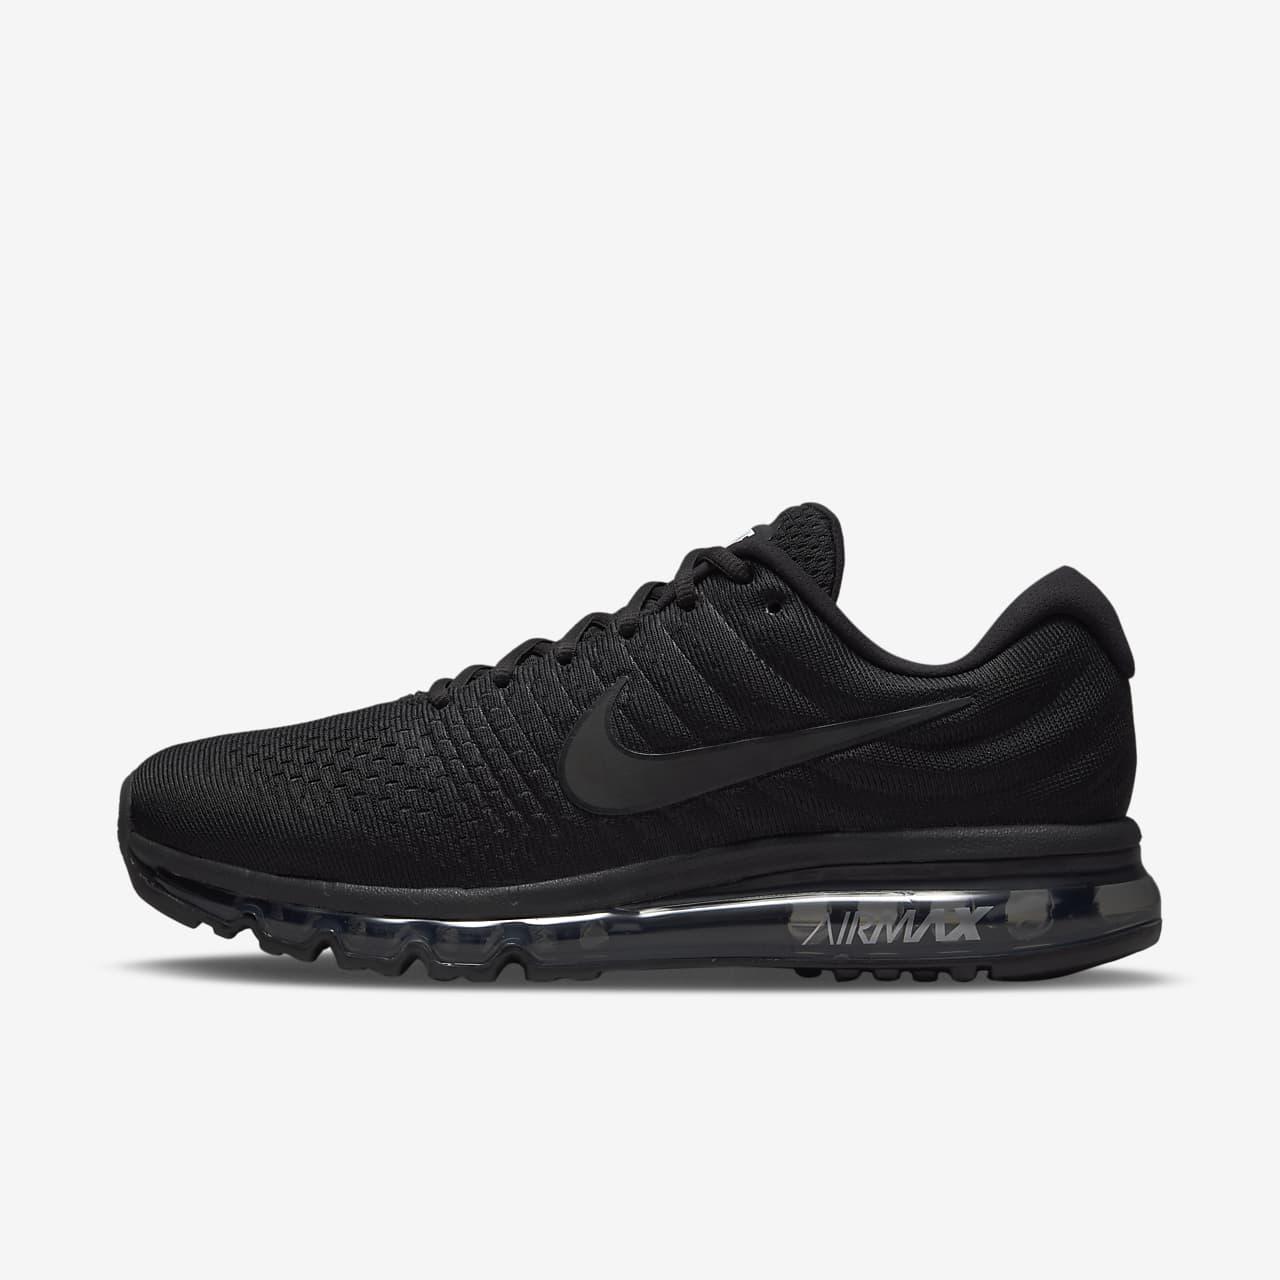 wholesale dealer 7e75d 87836 ... Nike Air Max 2017 herresko